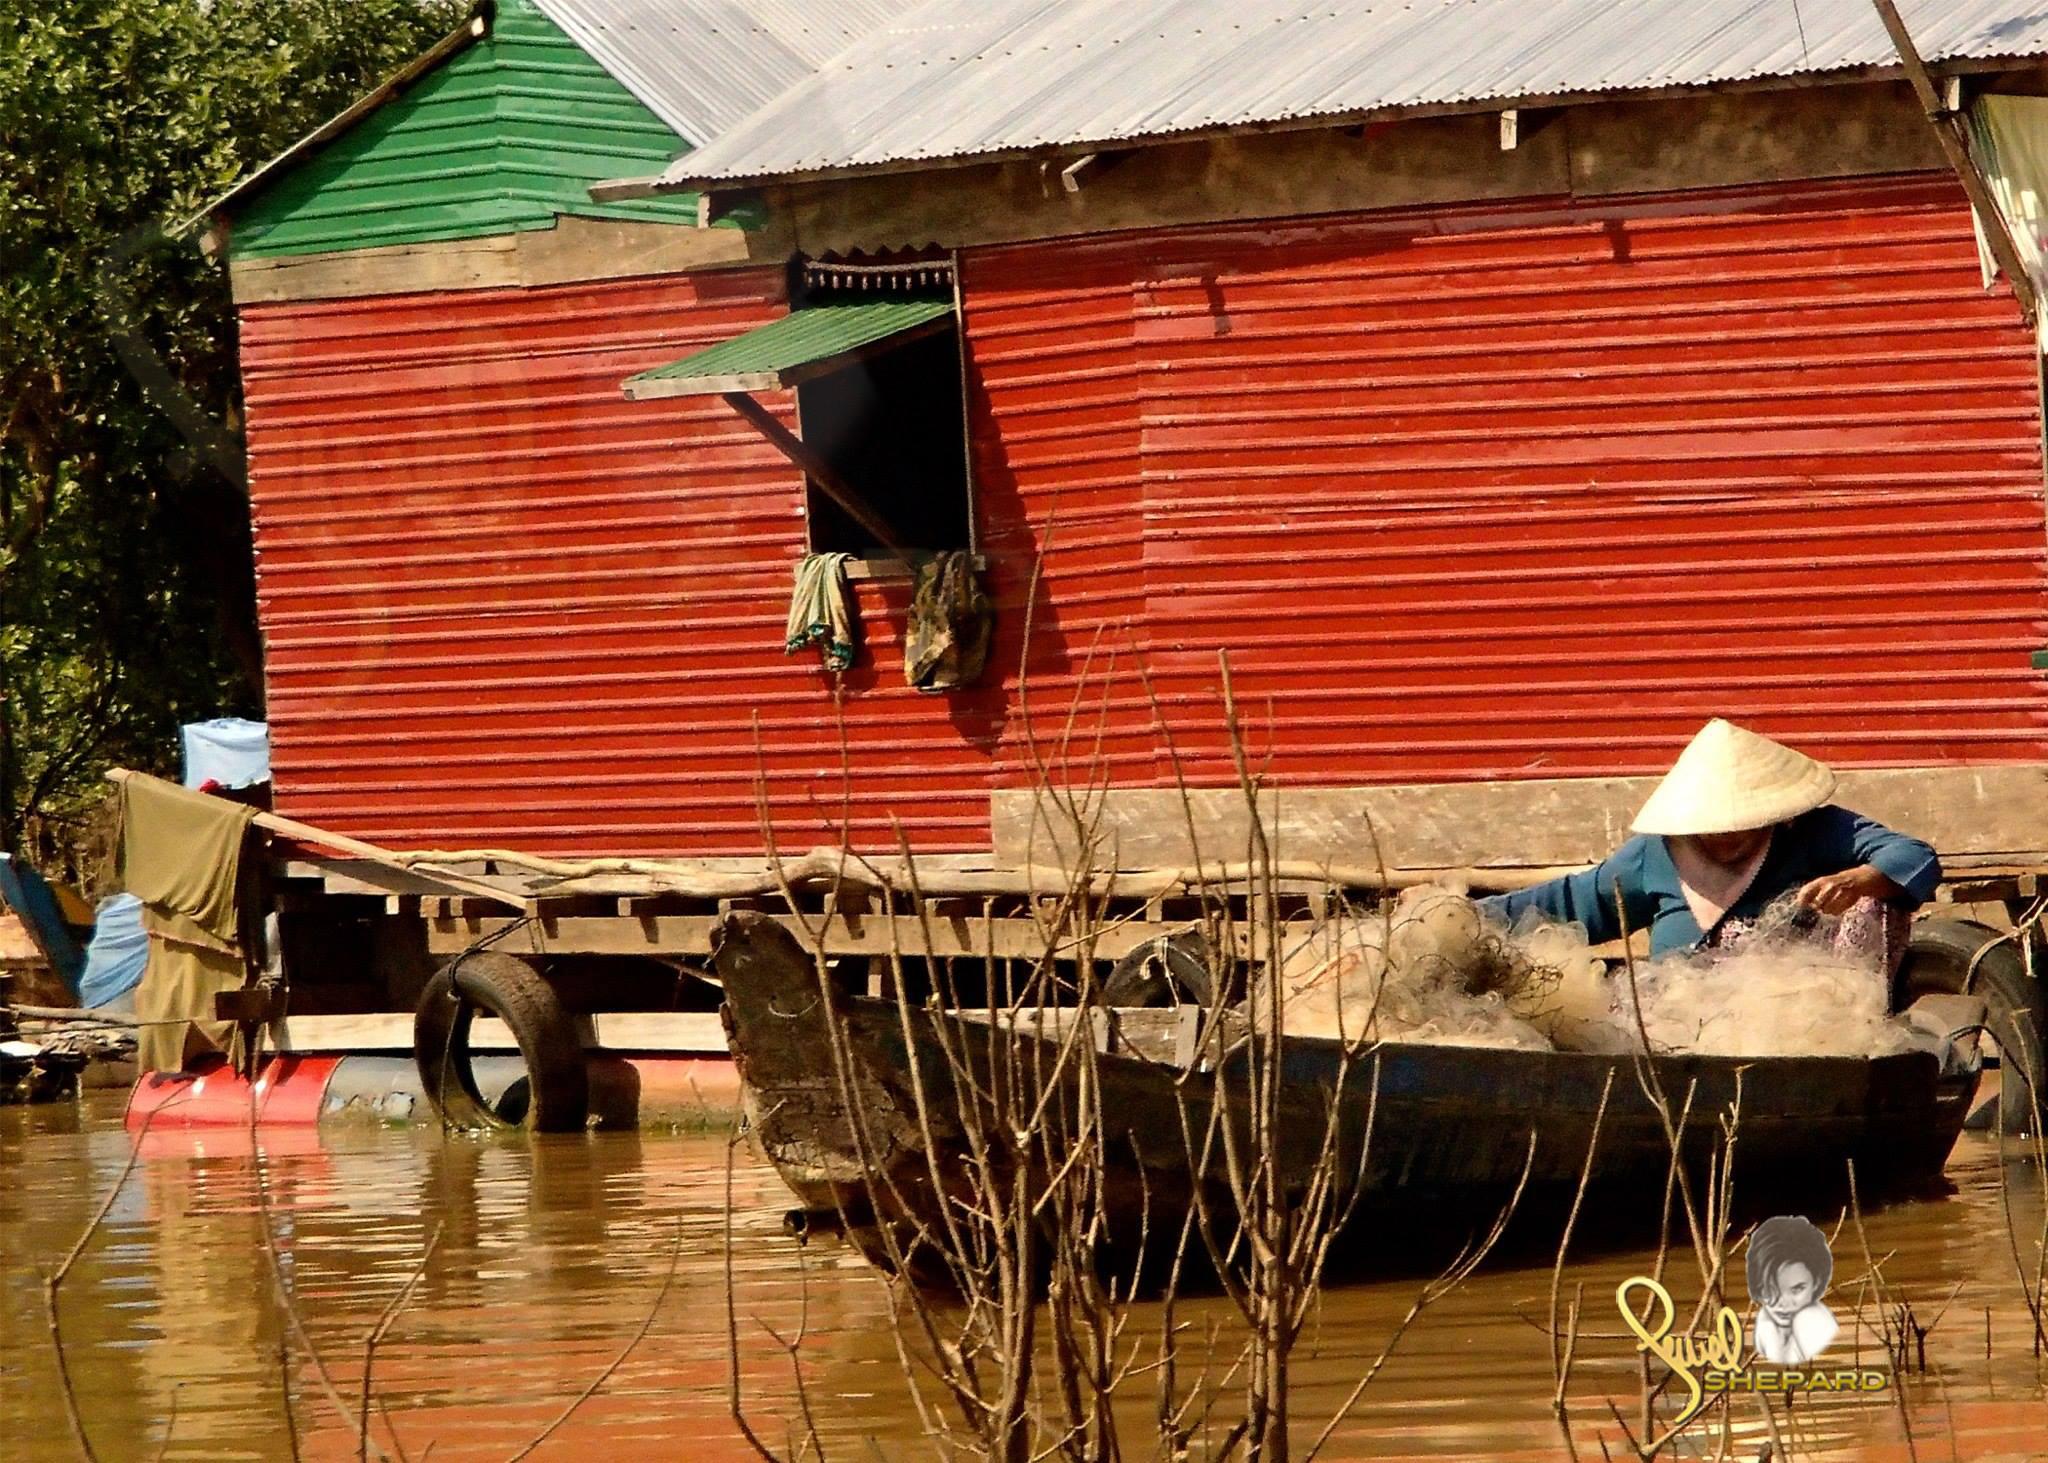 phnum-penh-cambodia-by-jewel-shepard